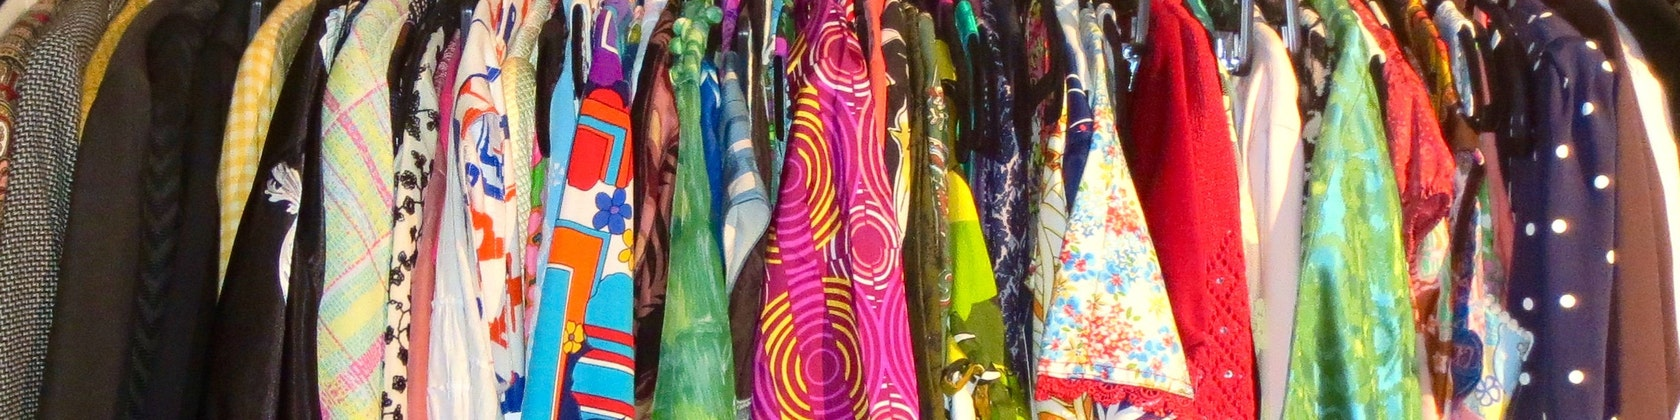 threads vintage clothing atlanta by threadsforlove on etsy